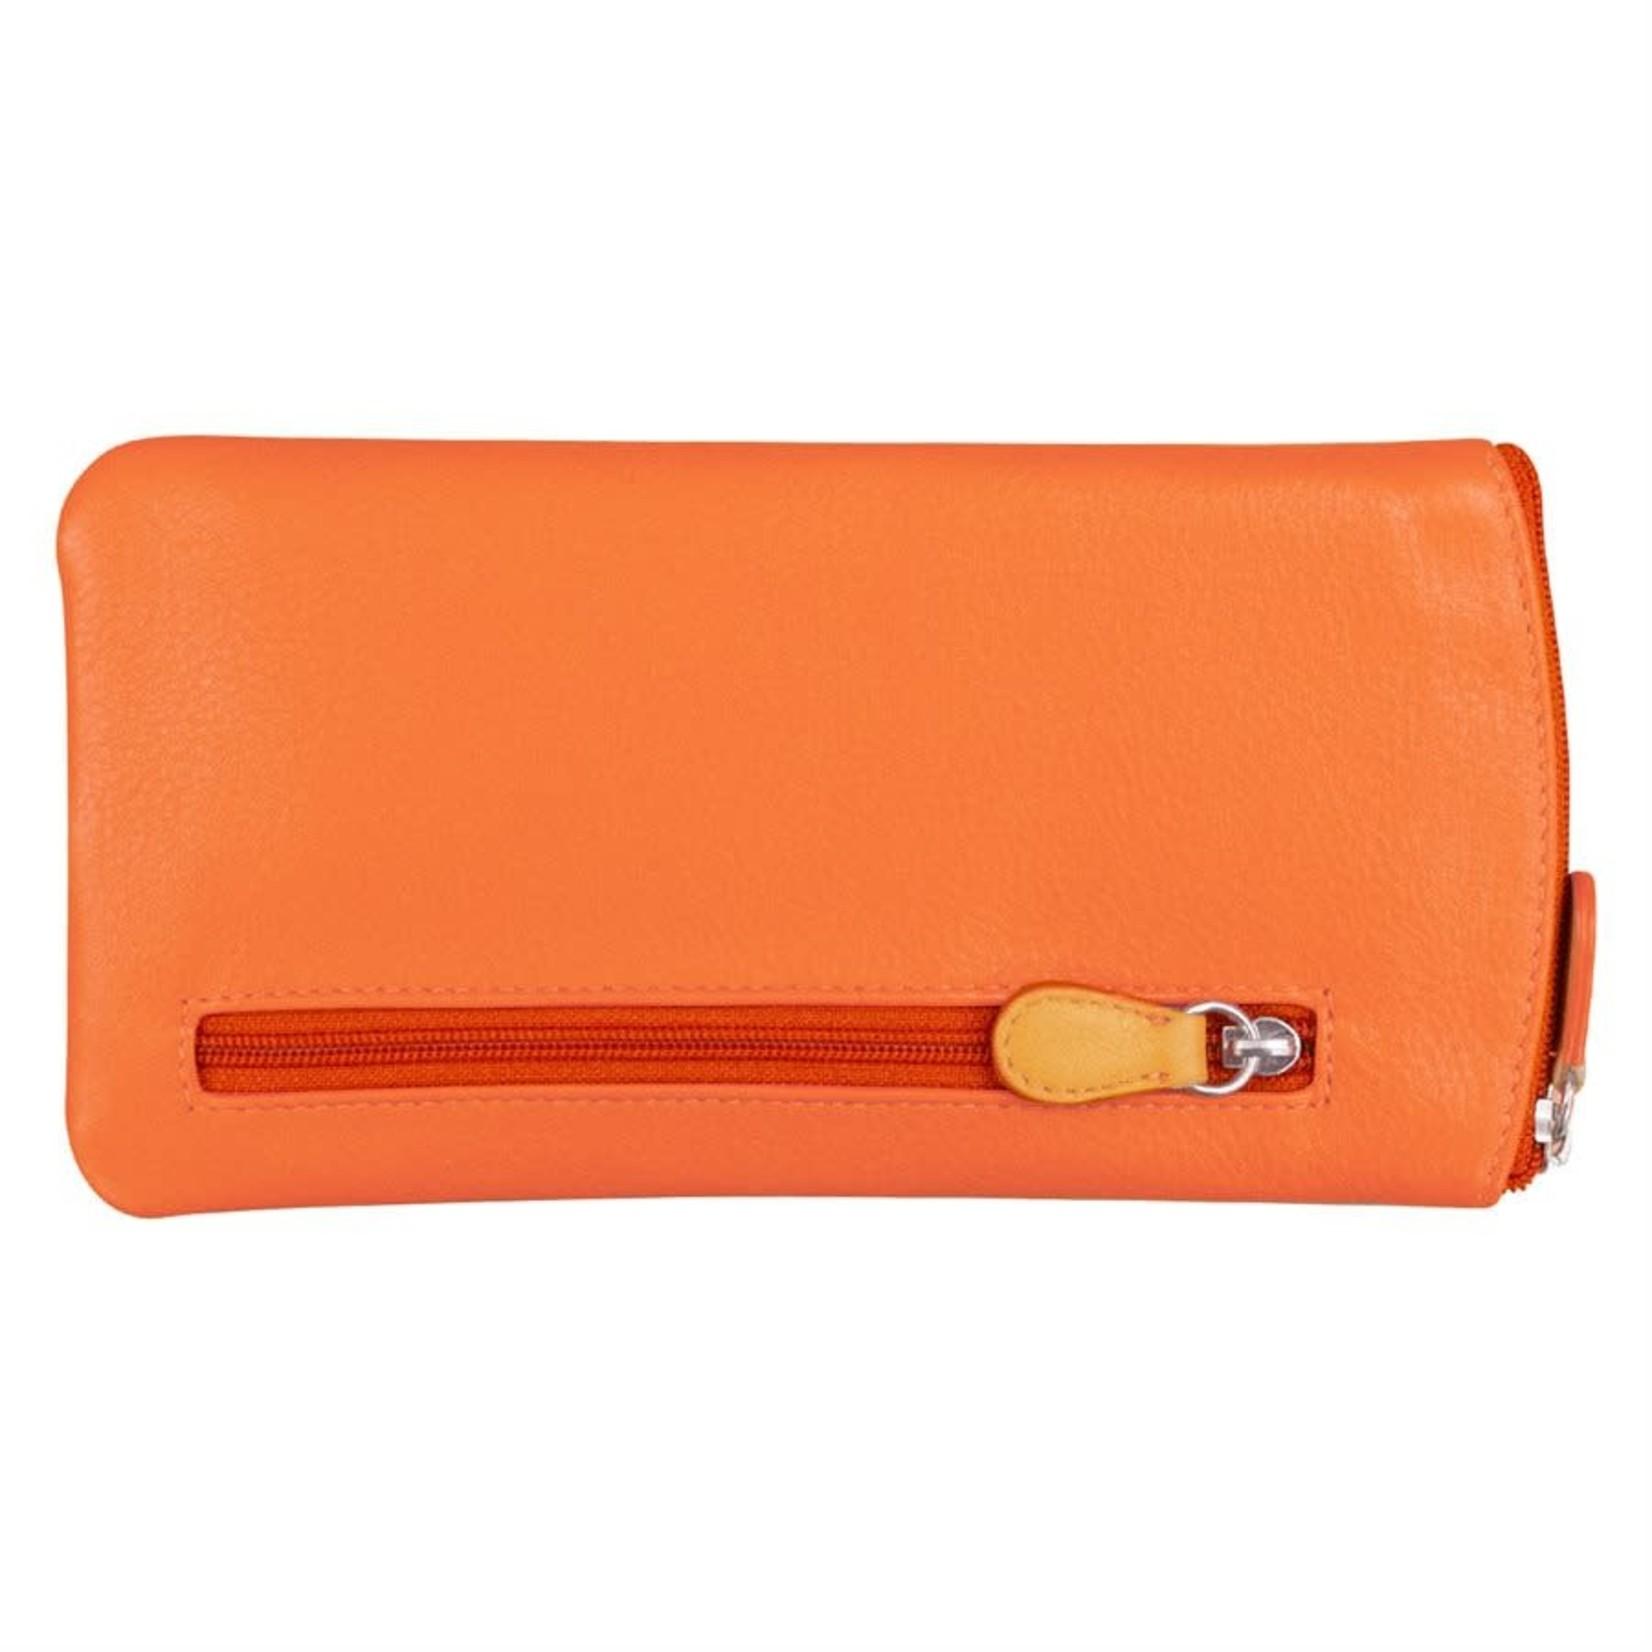 Leather Handbags and Accessories 6462 Papaya/Orange - Leather Eyeglass Case